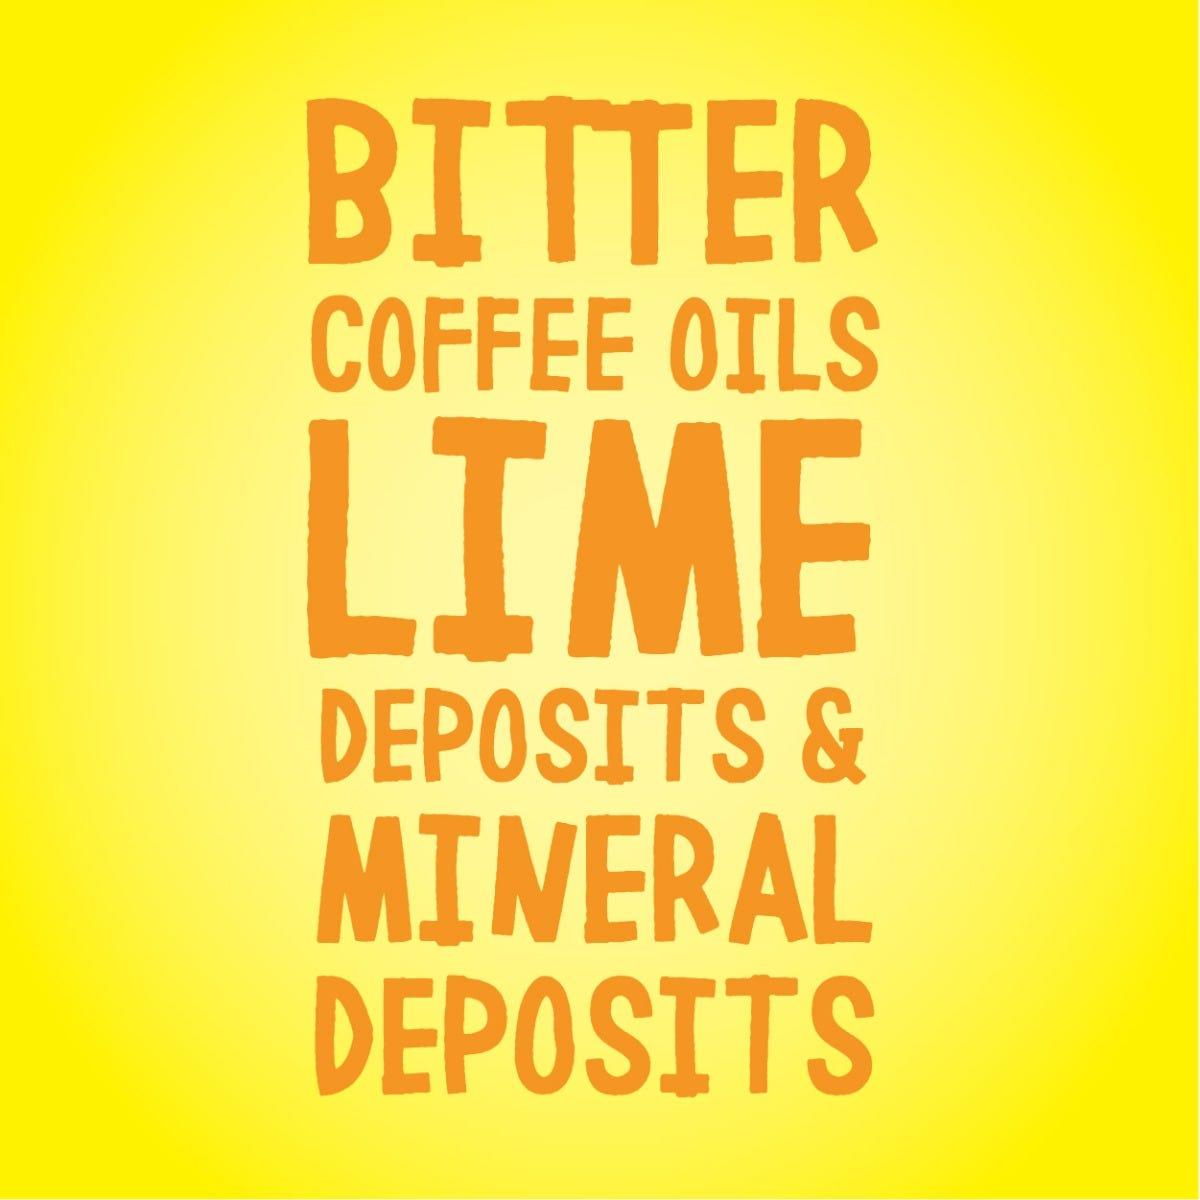 https://googone.com/media/catalog/product/c/o/coffee_maker_cleaner_benefits.jpg